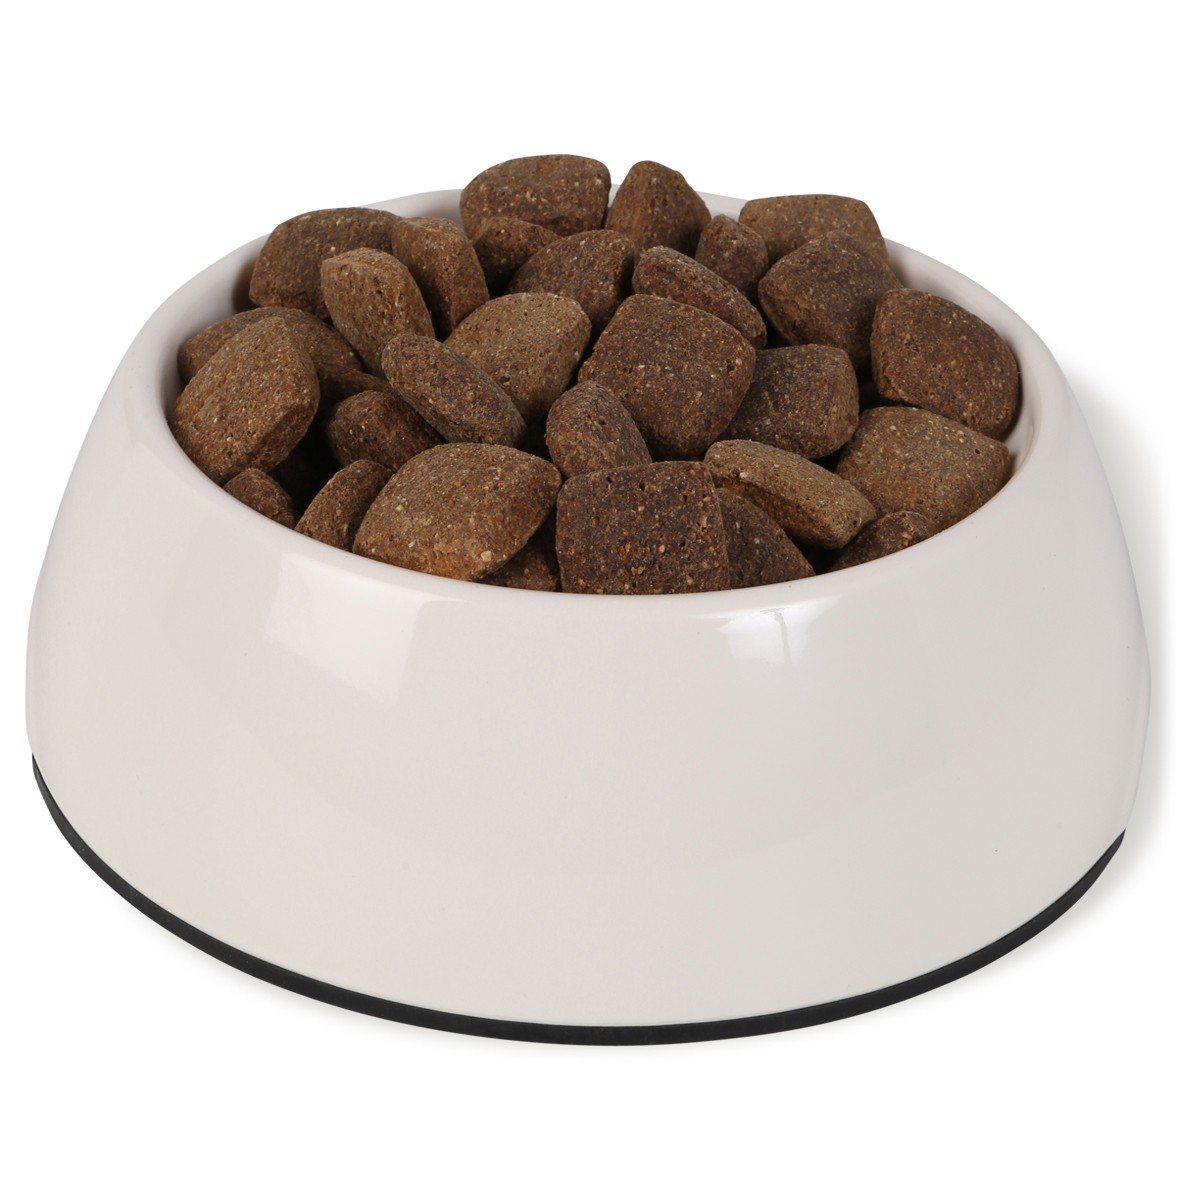 bosch hpc soft maxi wildschwein s kartoffel bei zooroyal. Black Bedroom Furniture Sets. Home Design Ideas